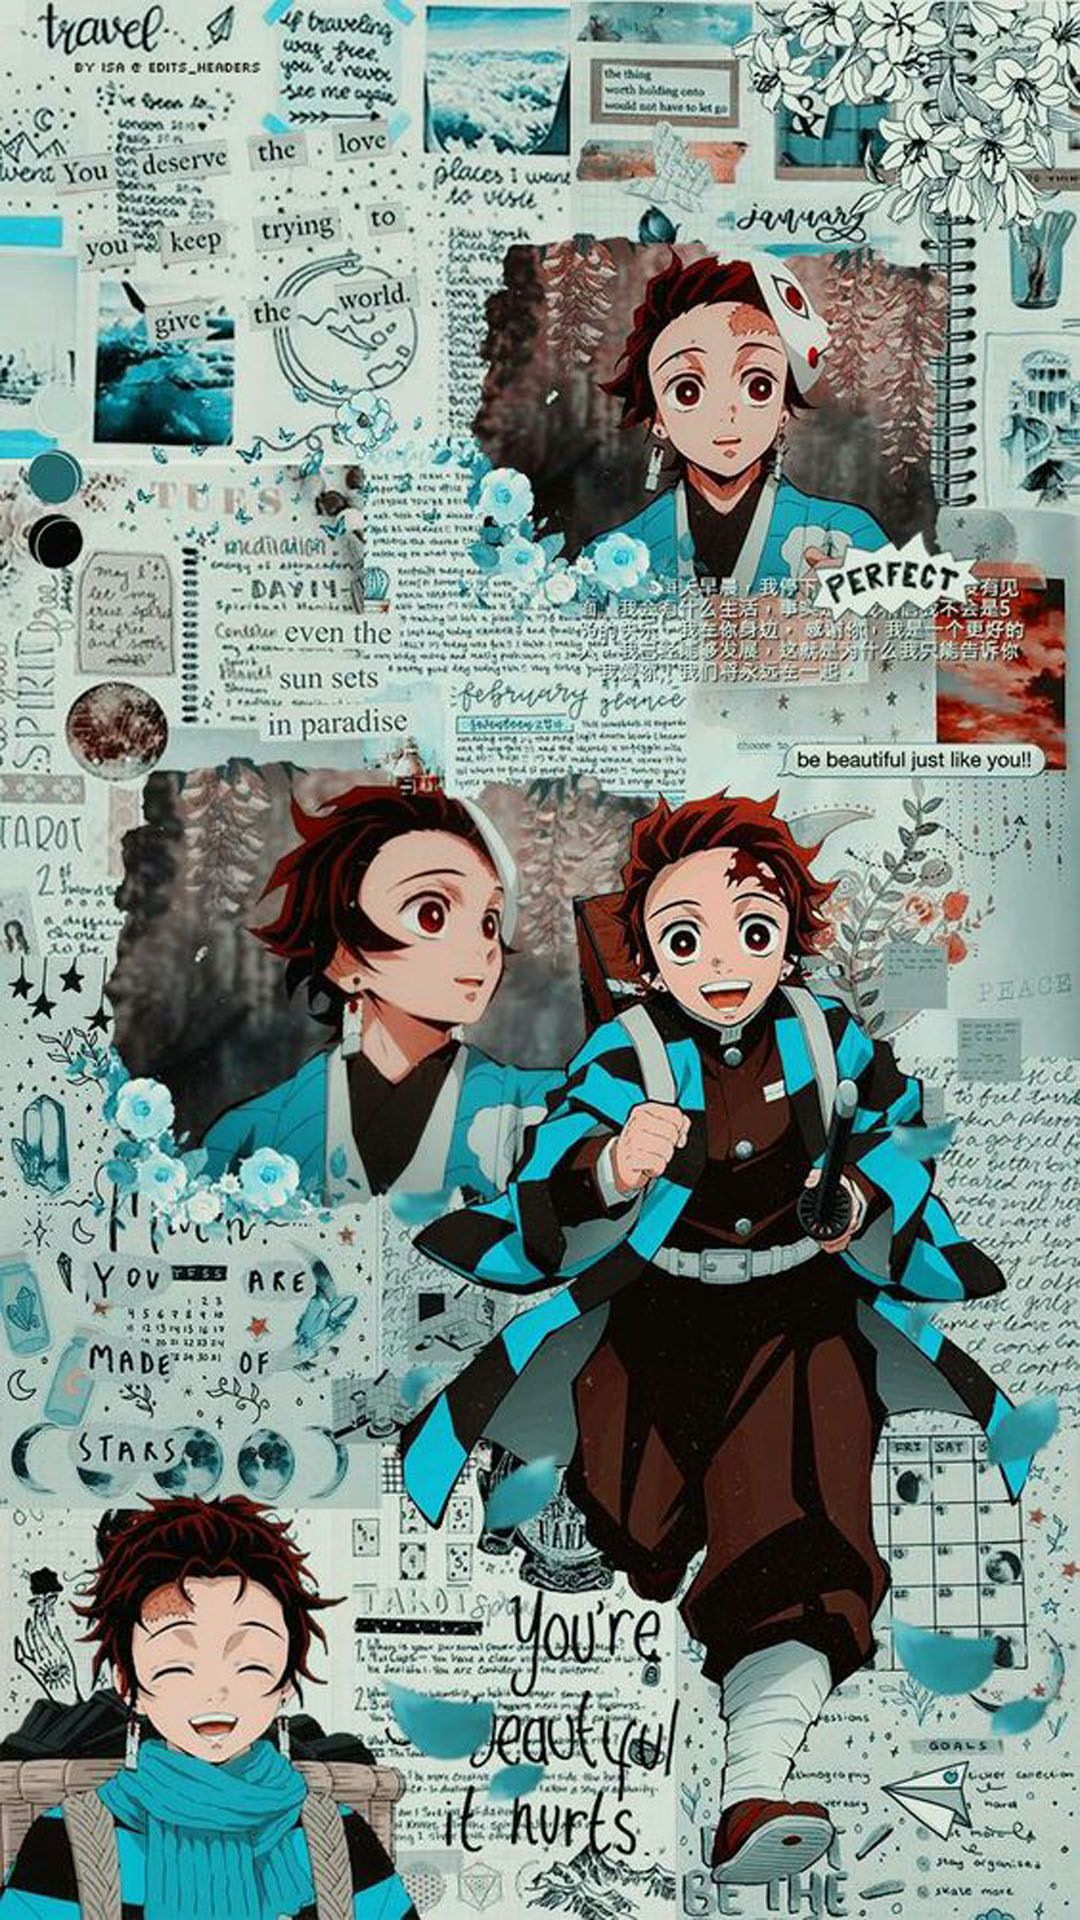 Best Demon Slayer Tanjiro Kamado HD Wallpaper 2020 Anime